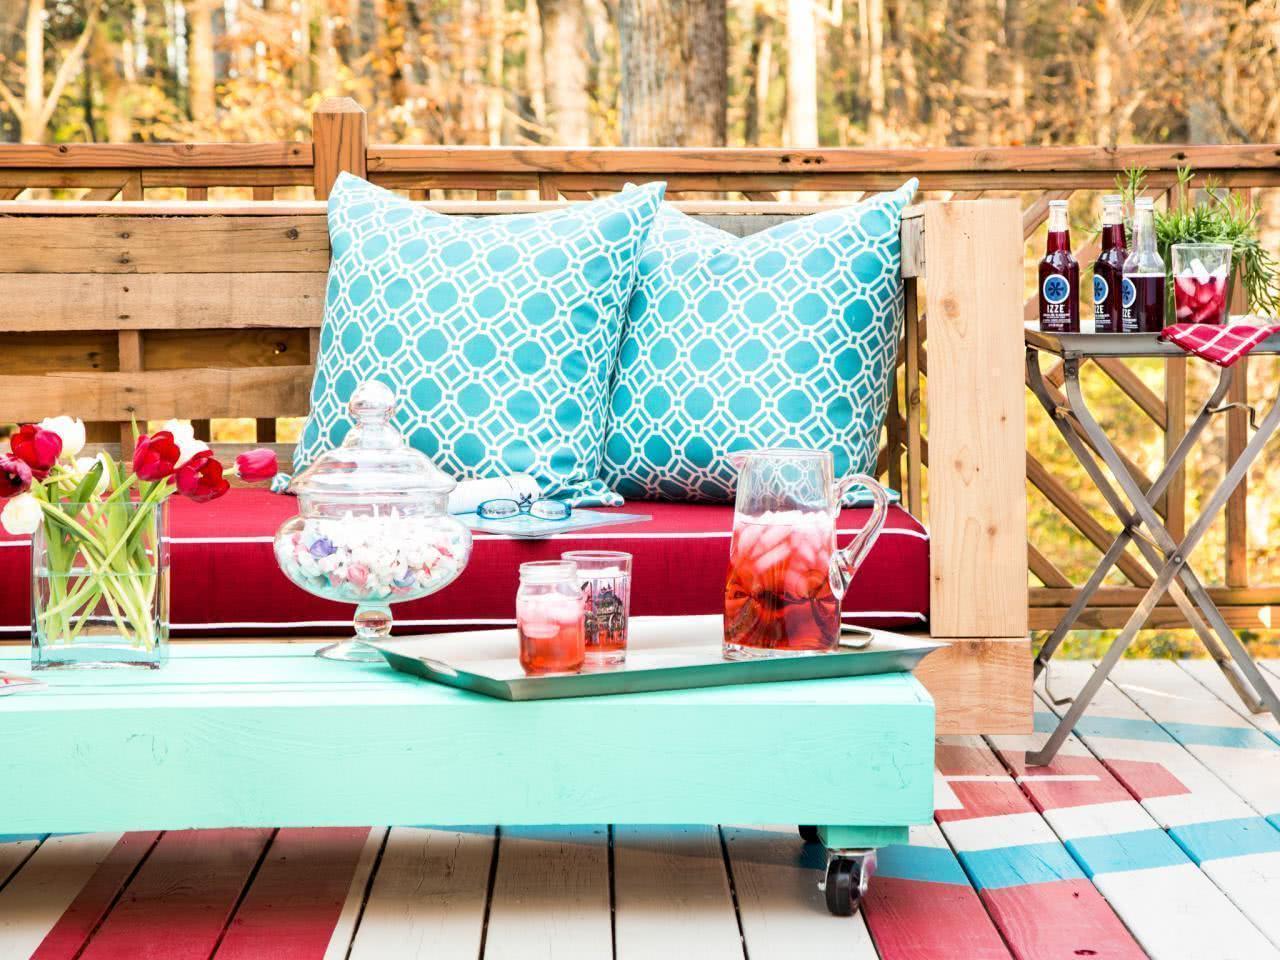 Sofá de pallet com mesa de centro azul turquesa